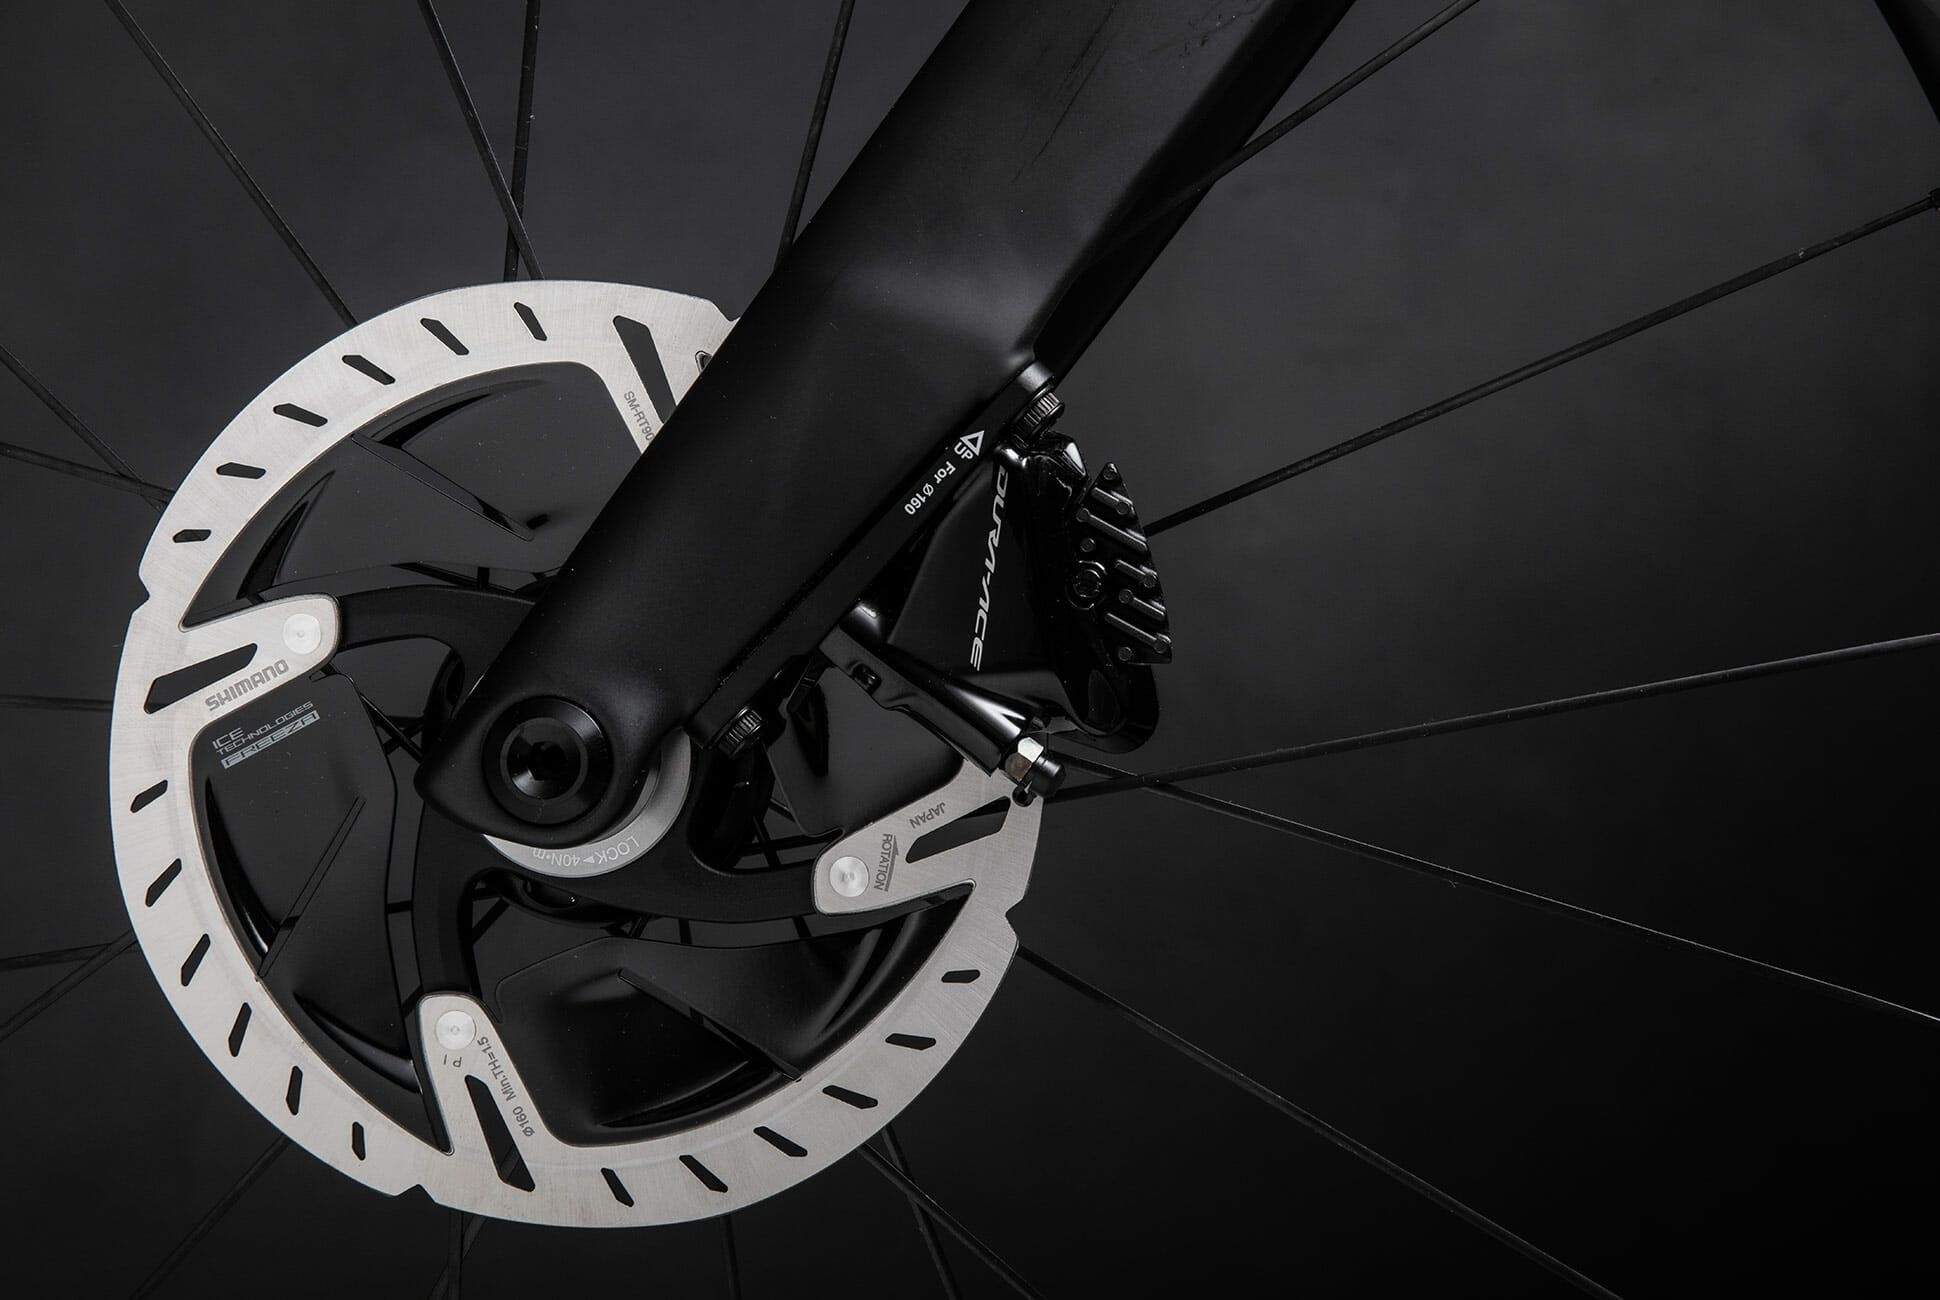 Specialized-S-Works-Venge-Road-Bike-gear-patrol-slide-10